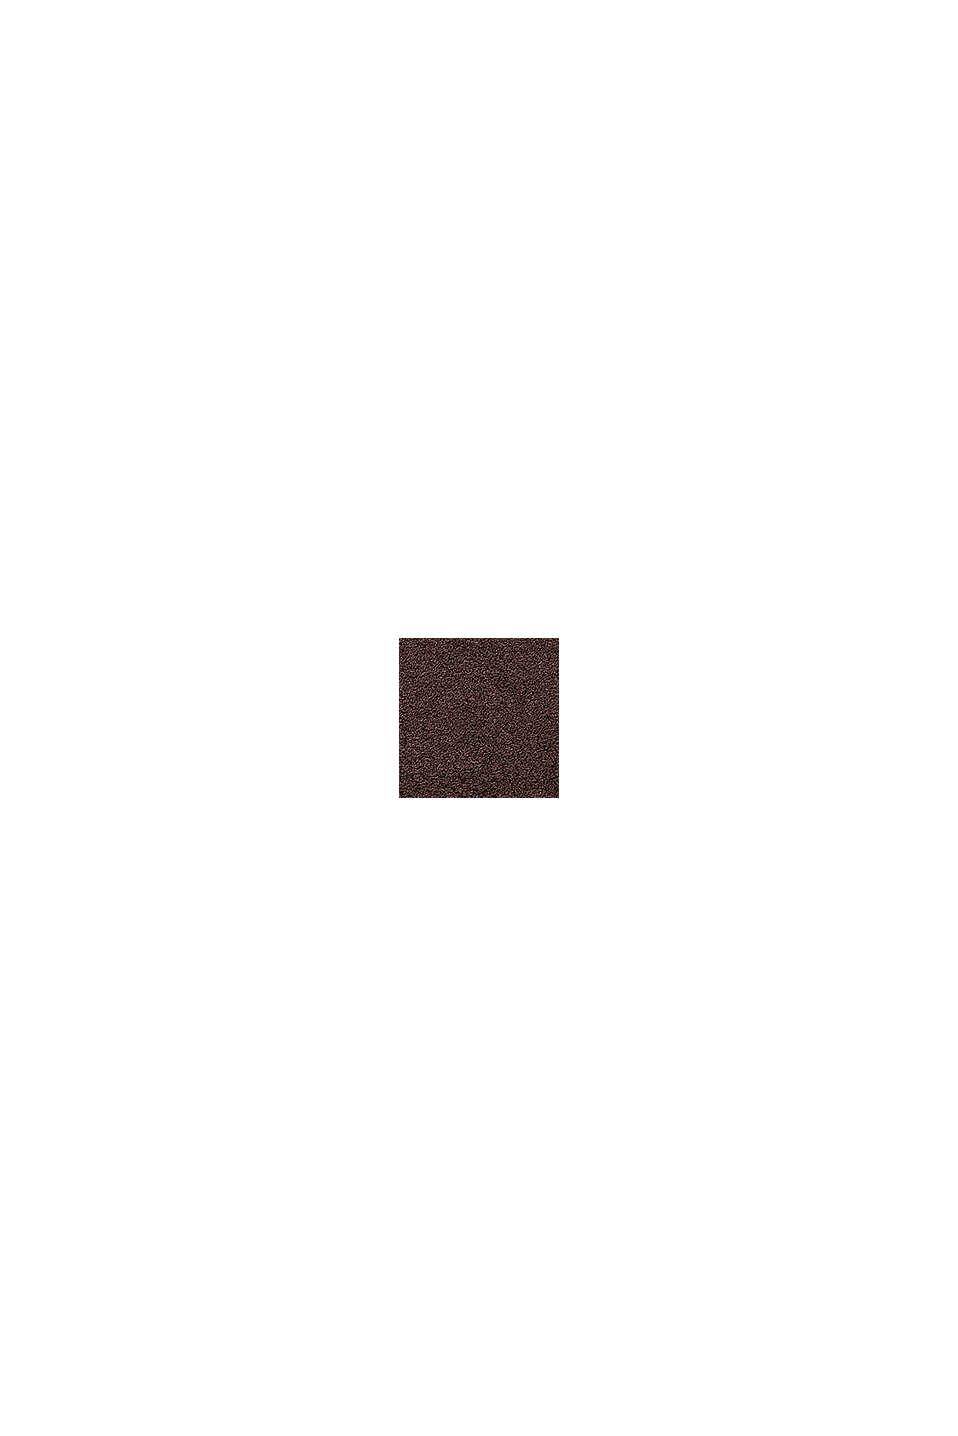 Terrycloth bath mat made of 100% cotton, CHOCOLATE, swatch